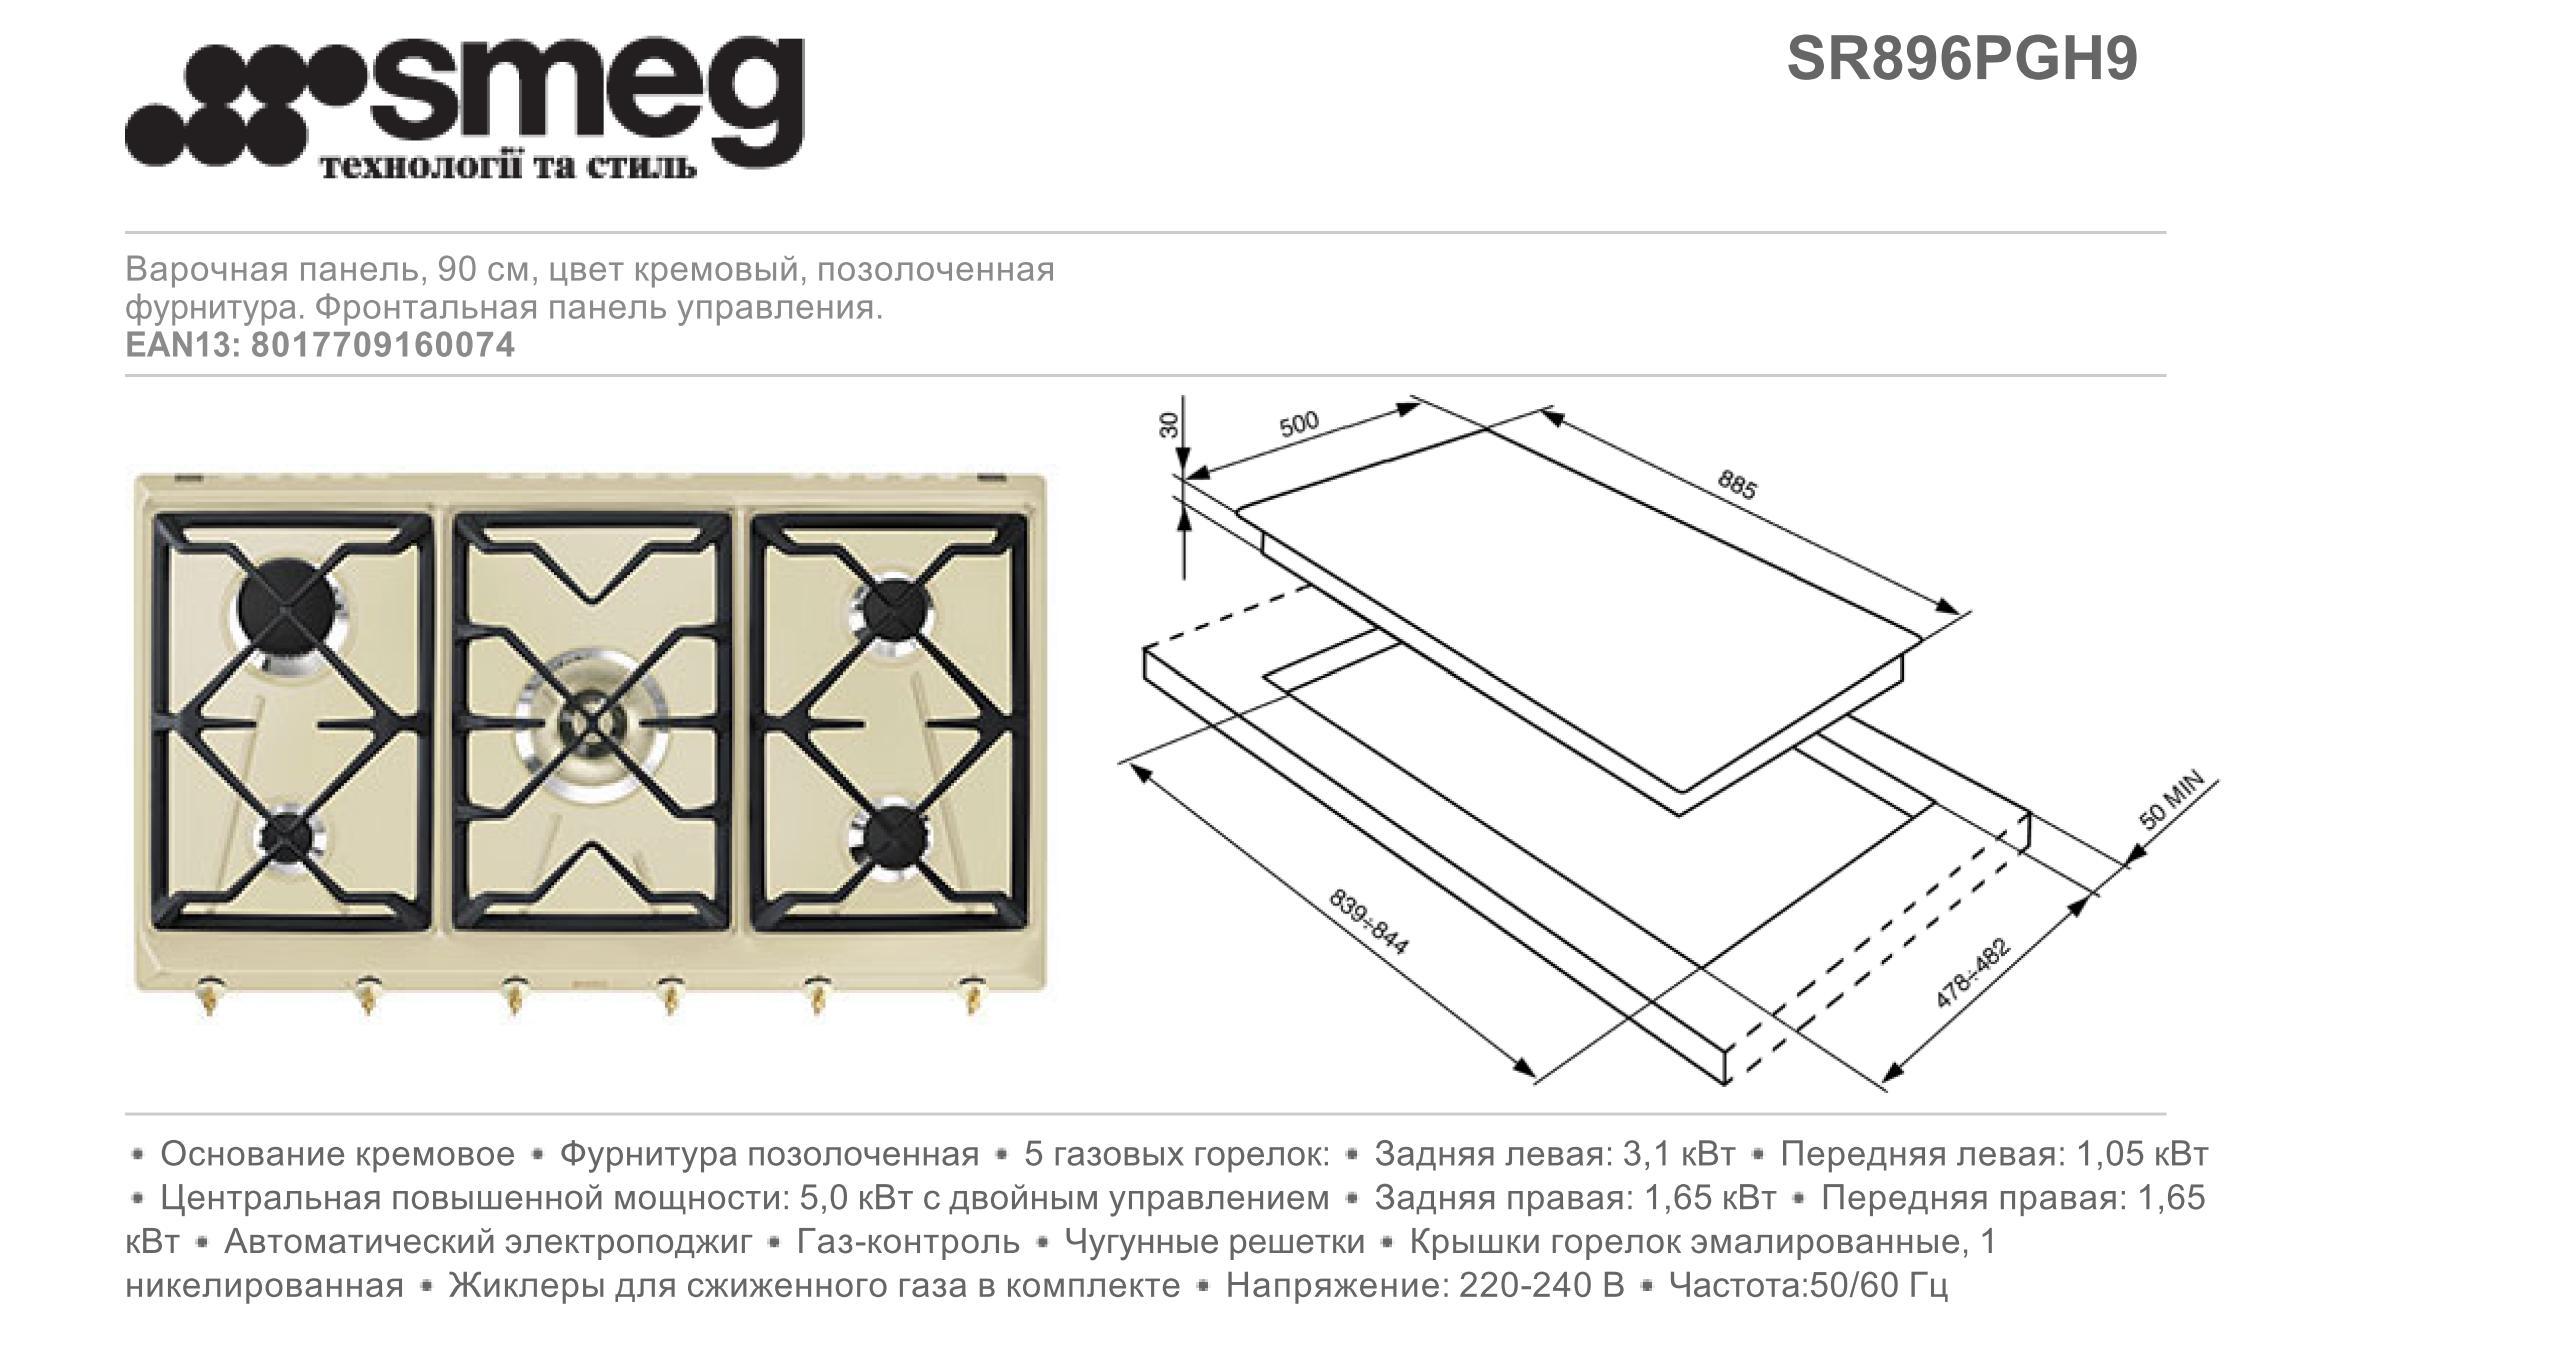 http://www.btmarket.com.ua/img_upl2/SR896PGH9_mini.jpg